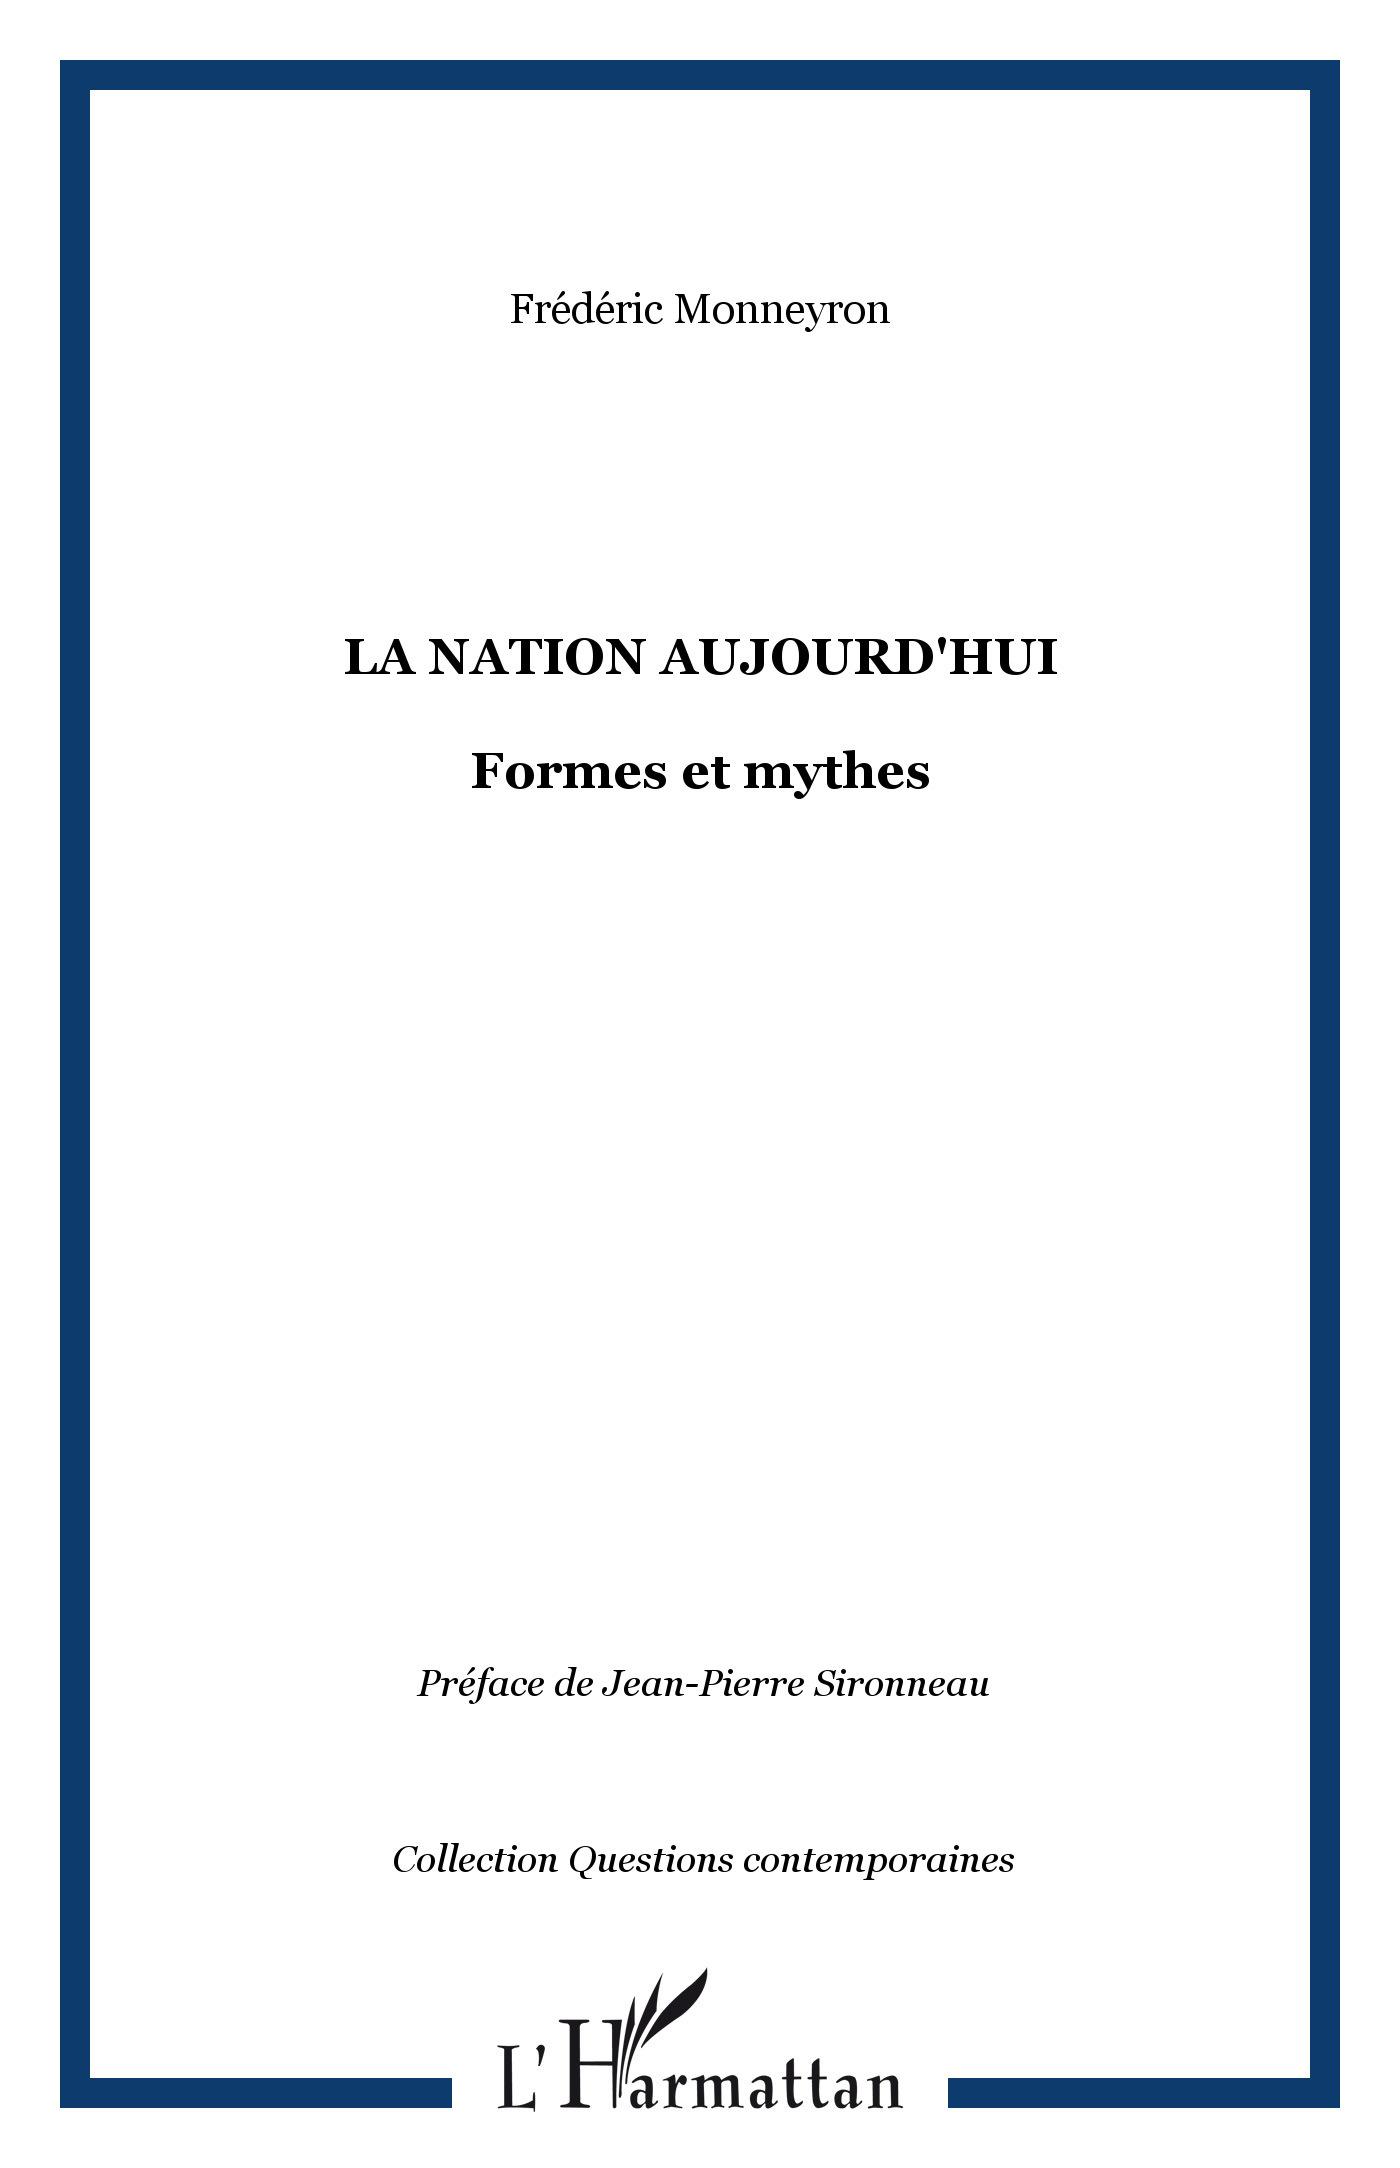 LA NATION AUJOURD'HUI - FORMES ET MYTHES